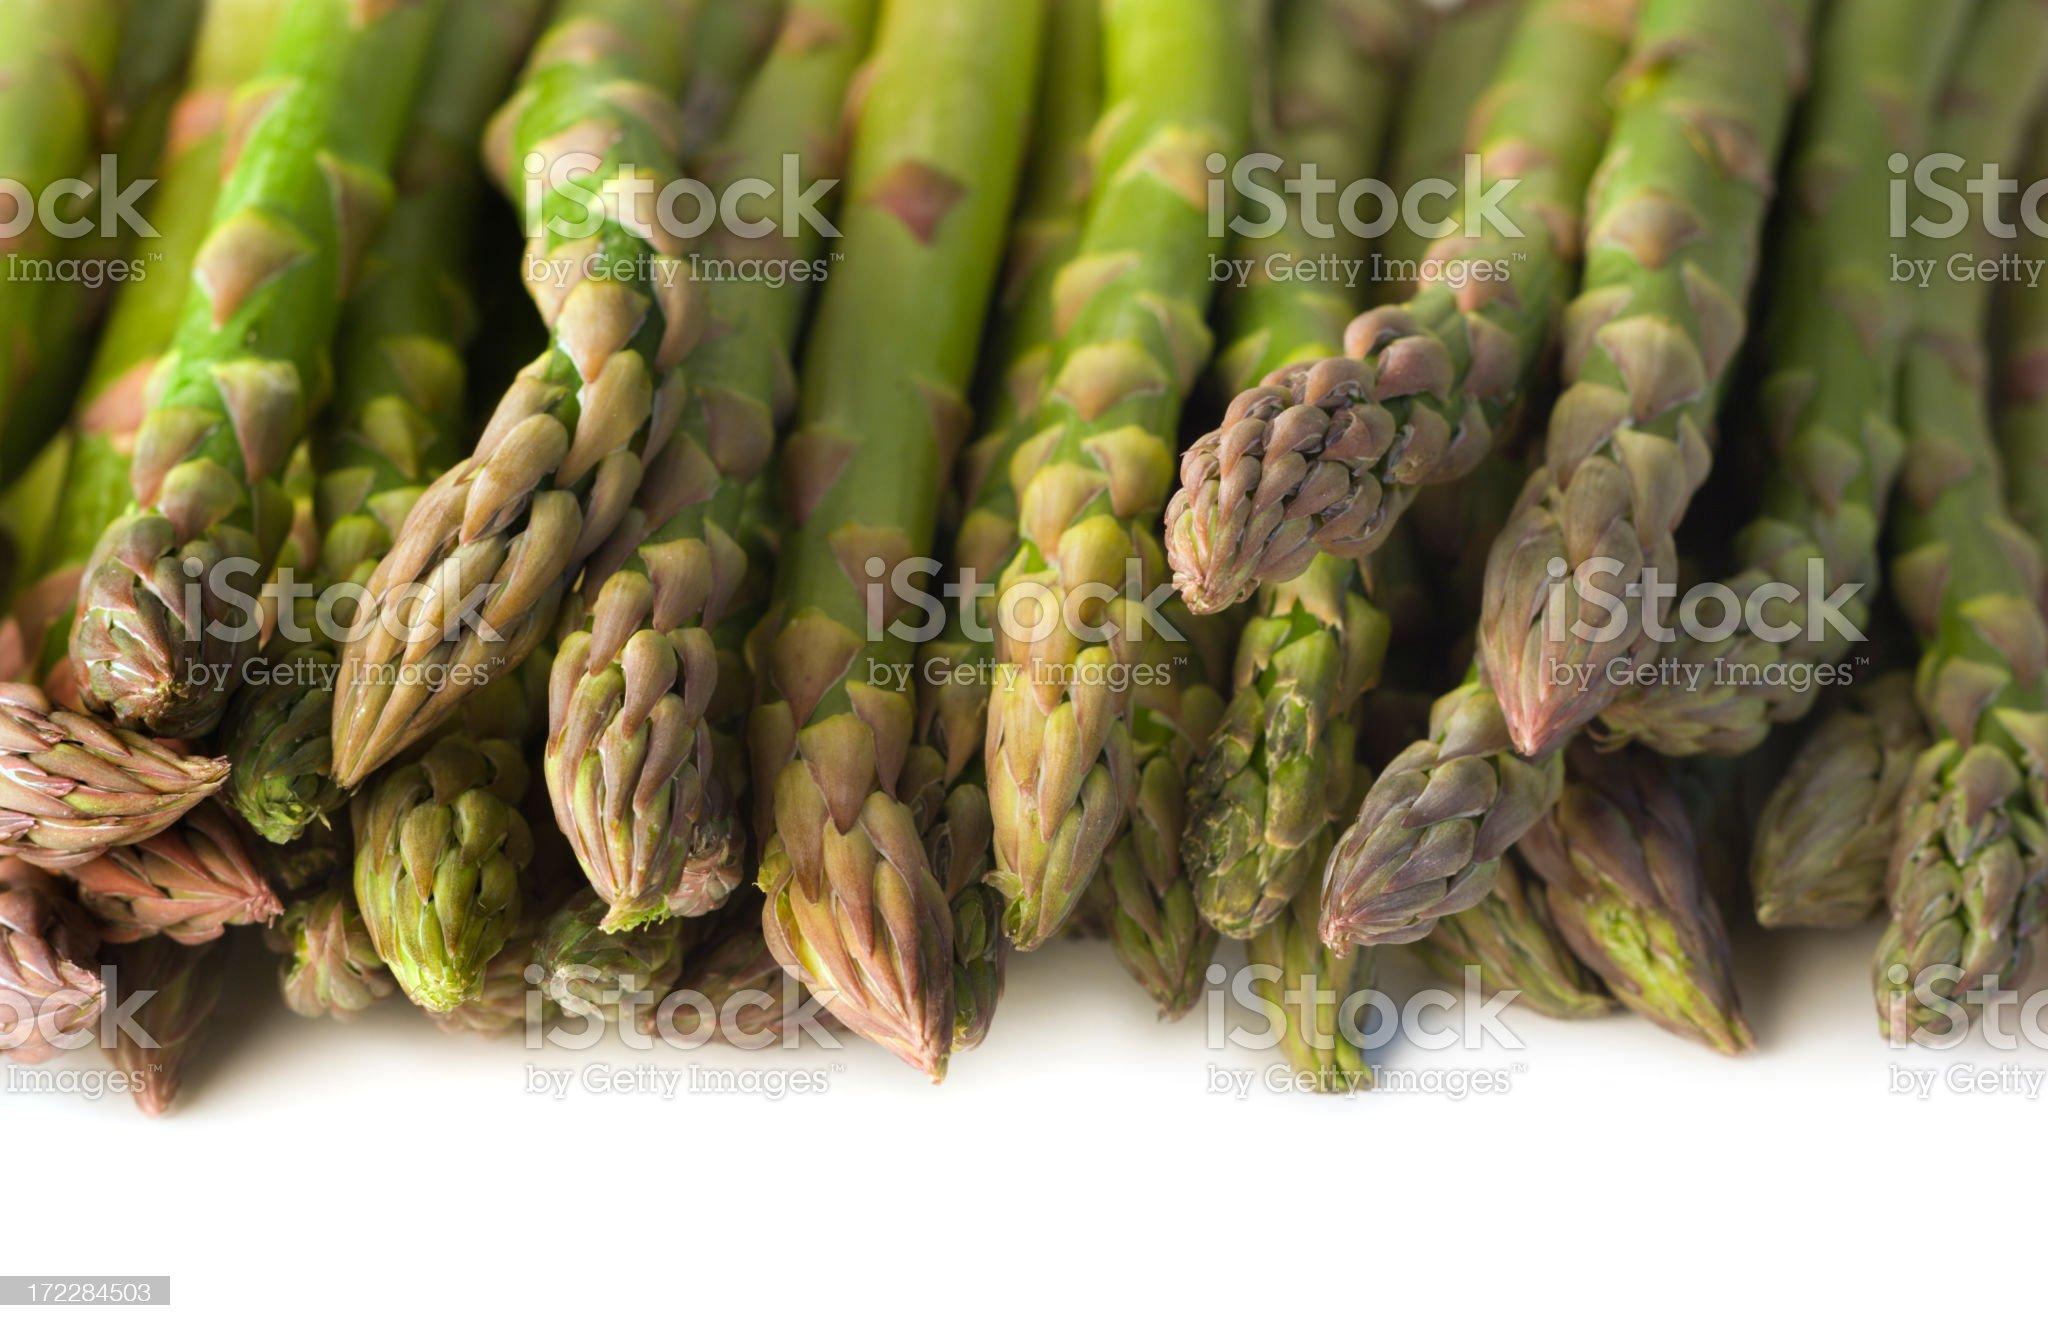 Green Asparagus Tips royalty-free stock photo